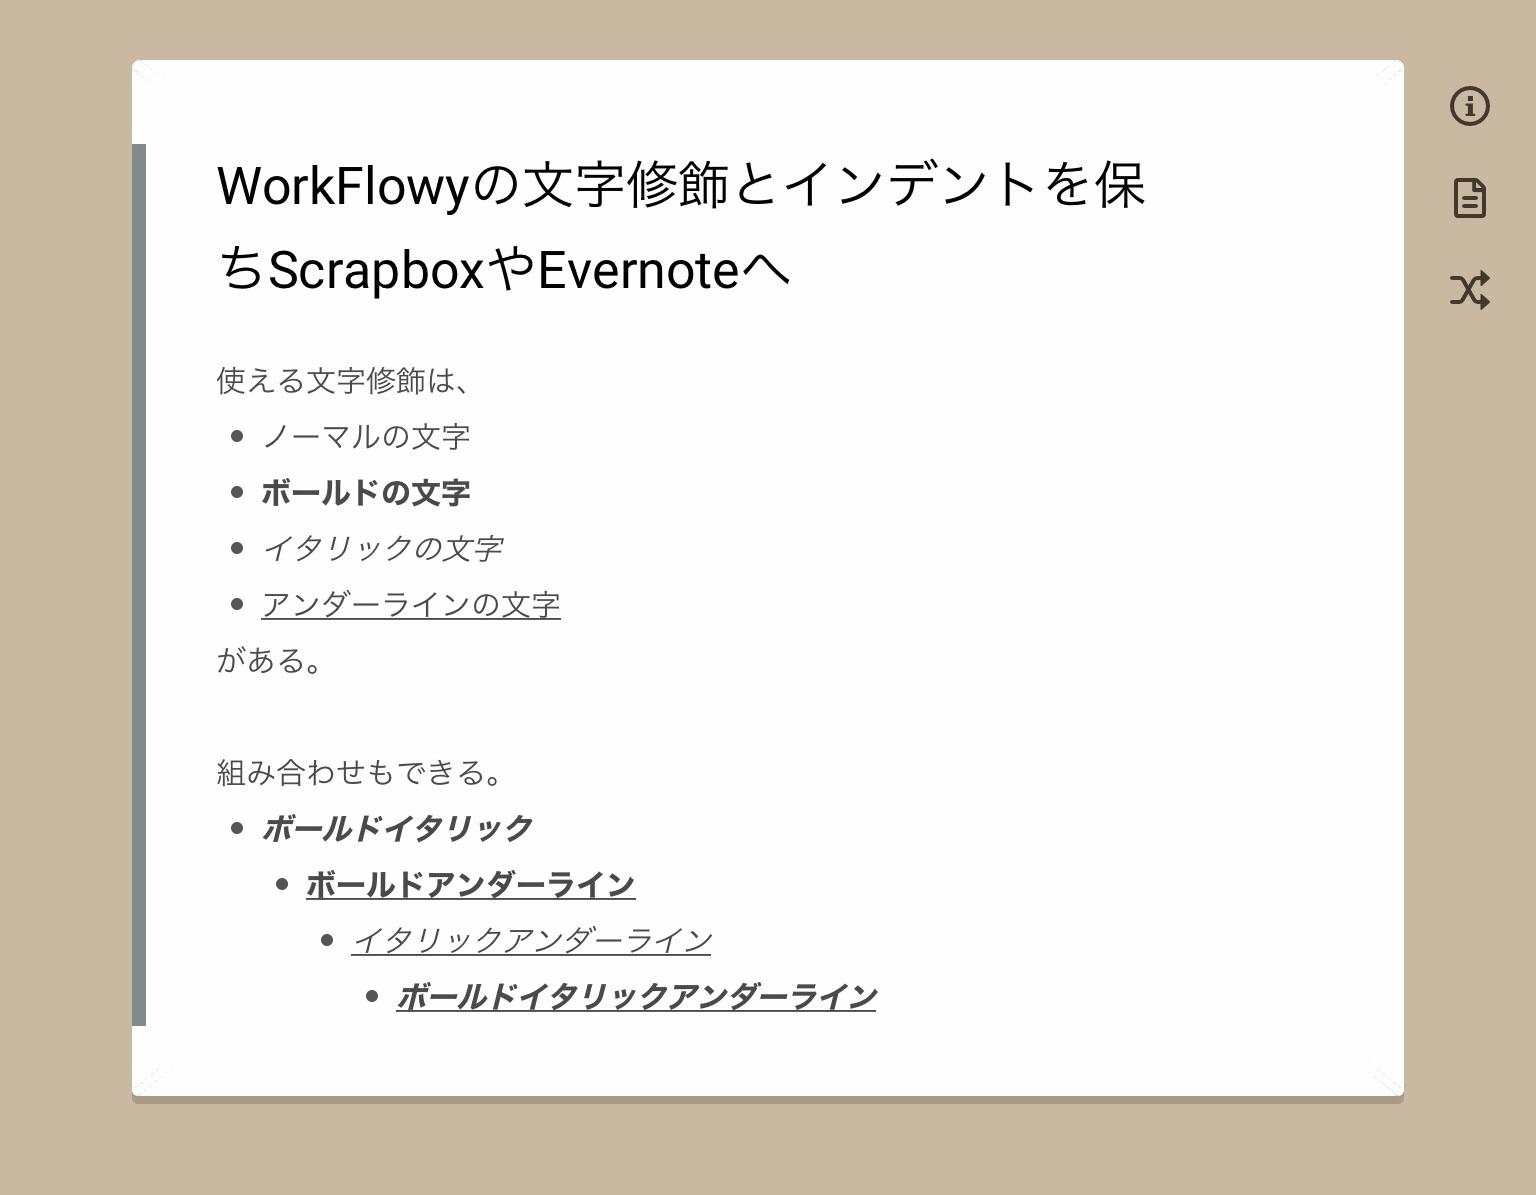 f:id:sorashima:20200801193345j:plain:w637